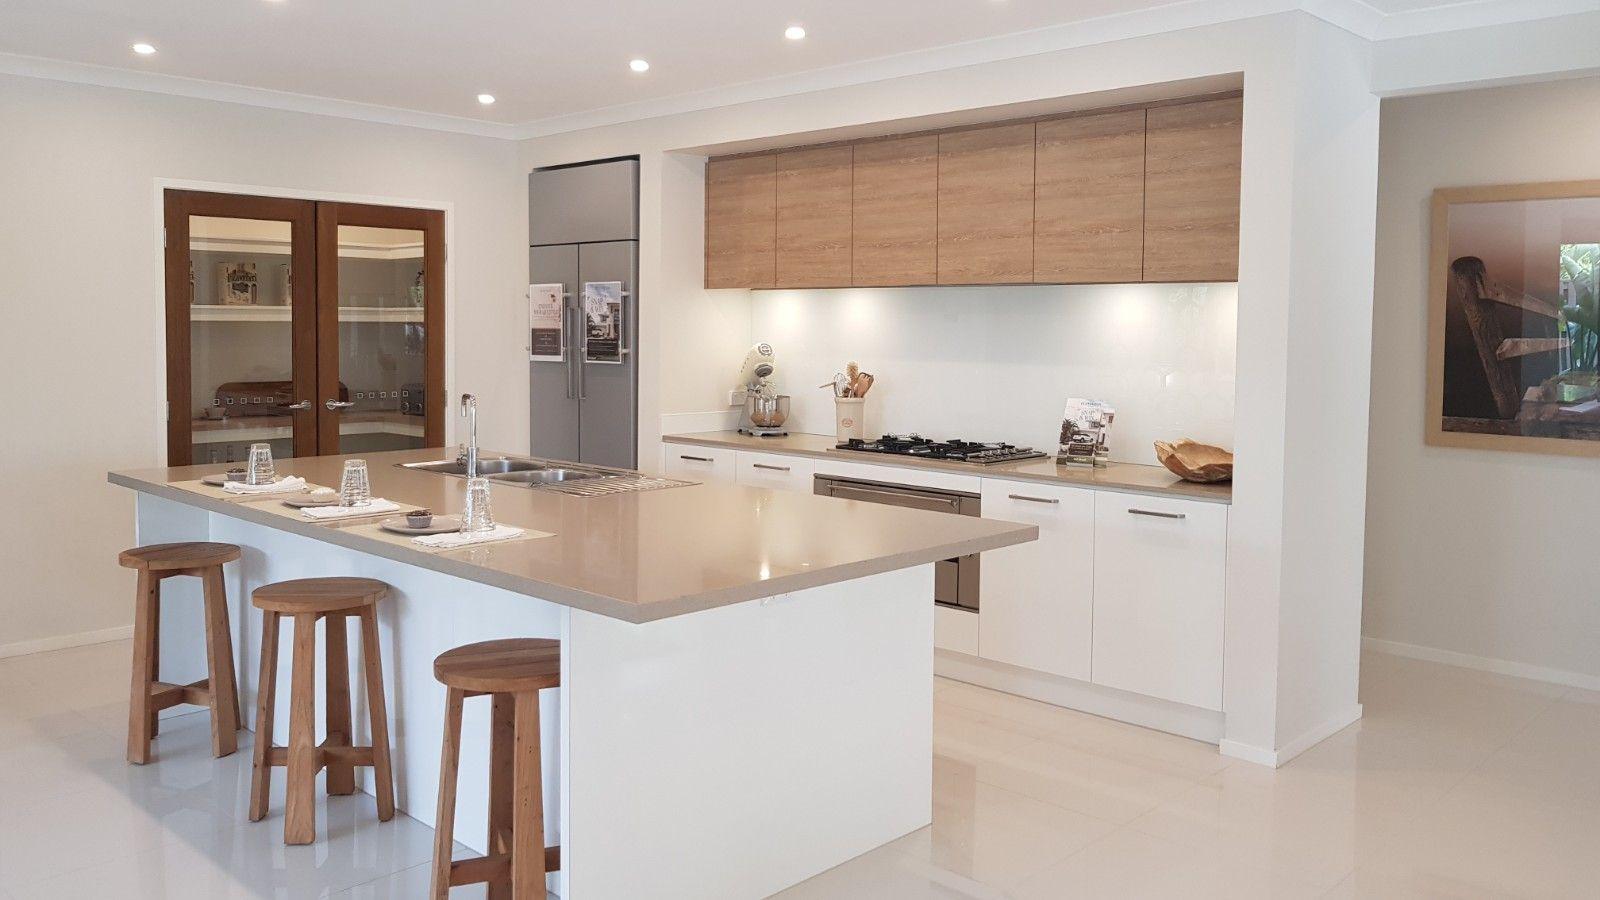 Pin by Seamus Kearney on Kitchen | Home decor, Decor ...